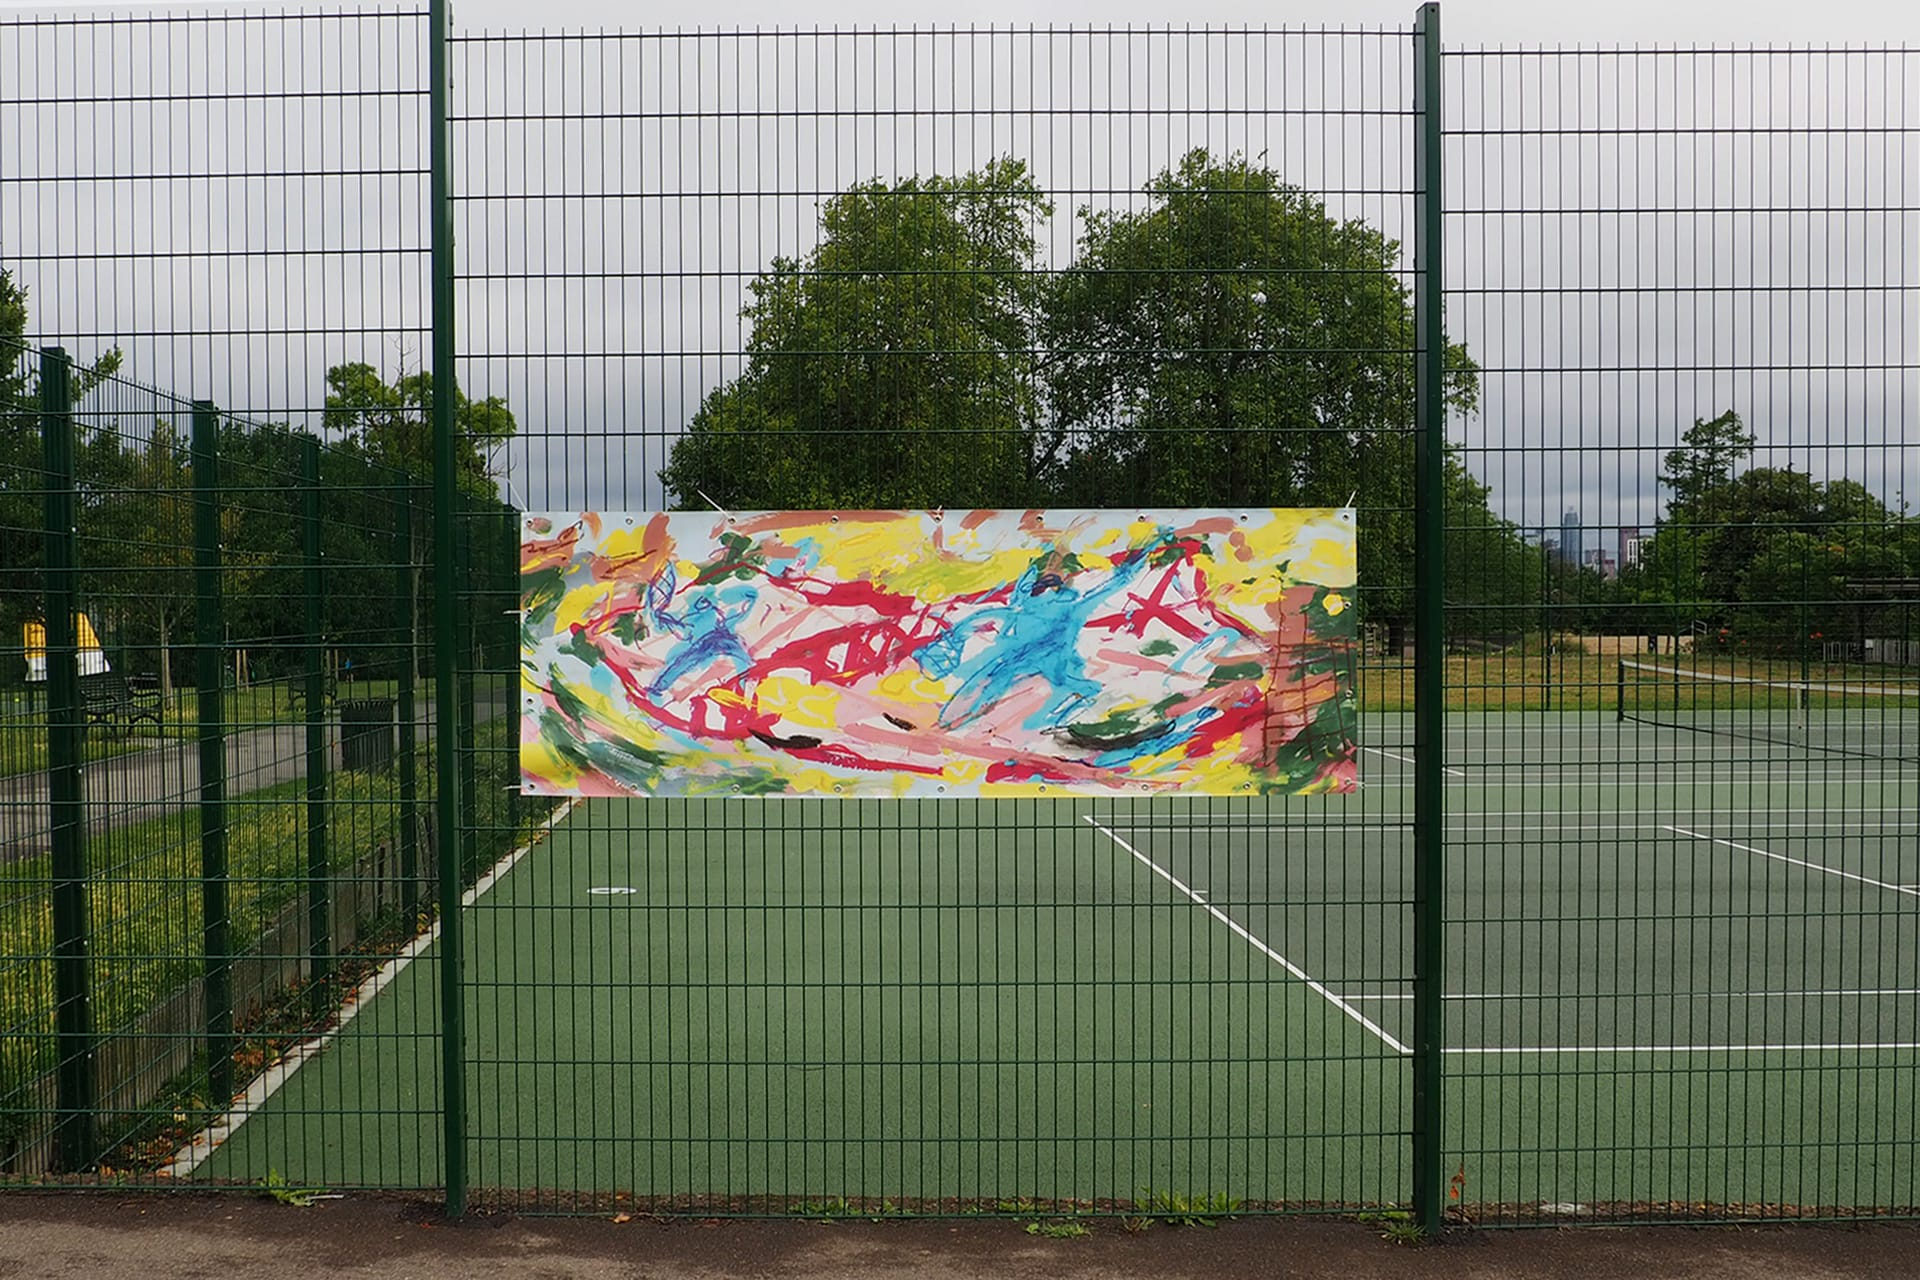 AWP (Tennis): ii